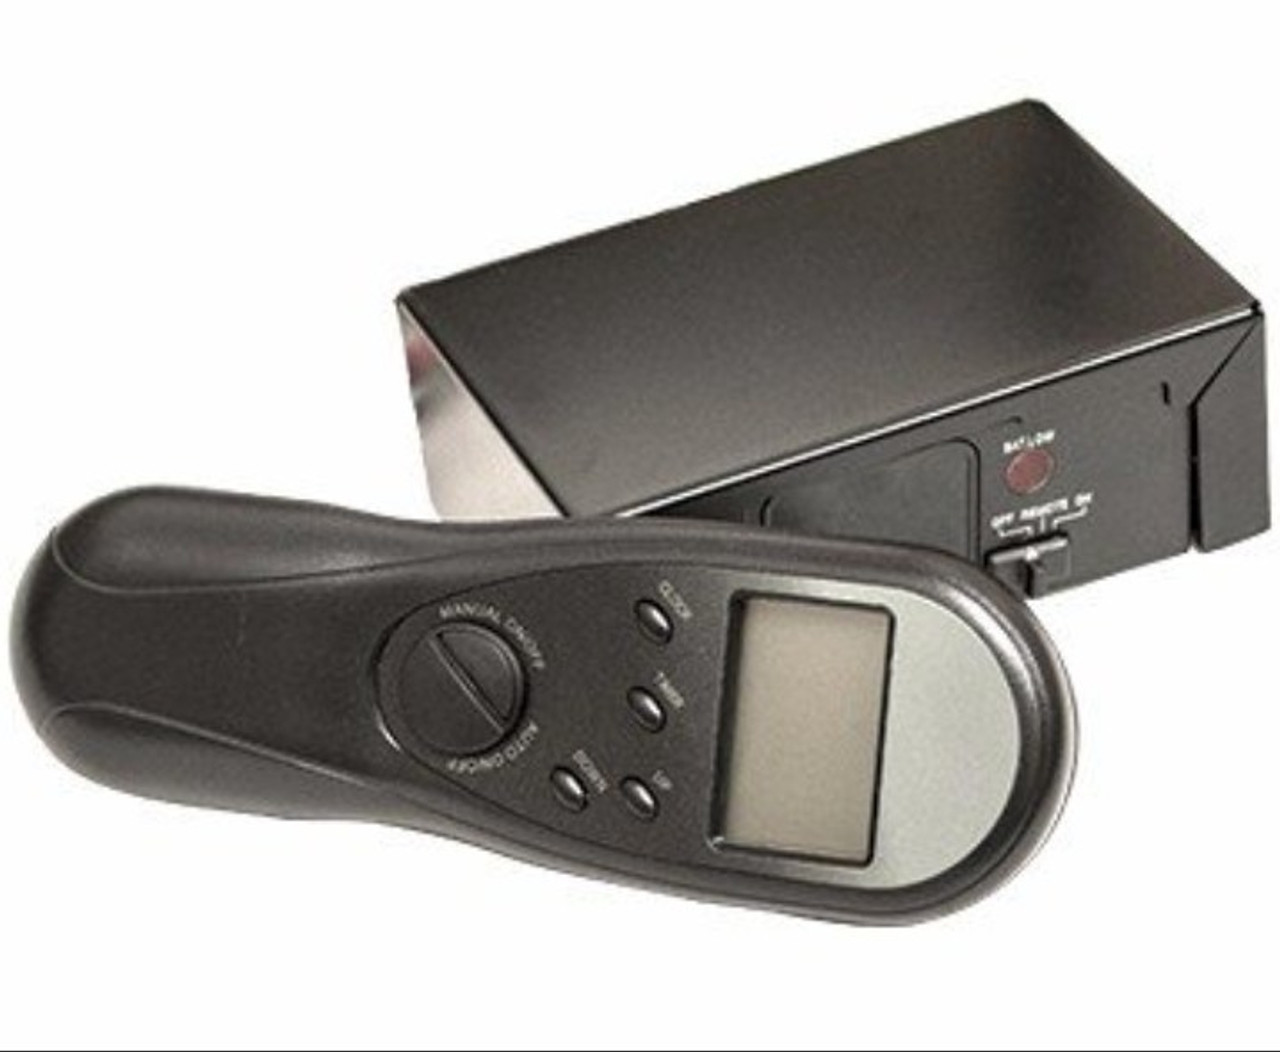 Thermostatic RCK-K Fireplace Remote